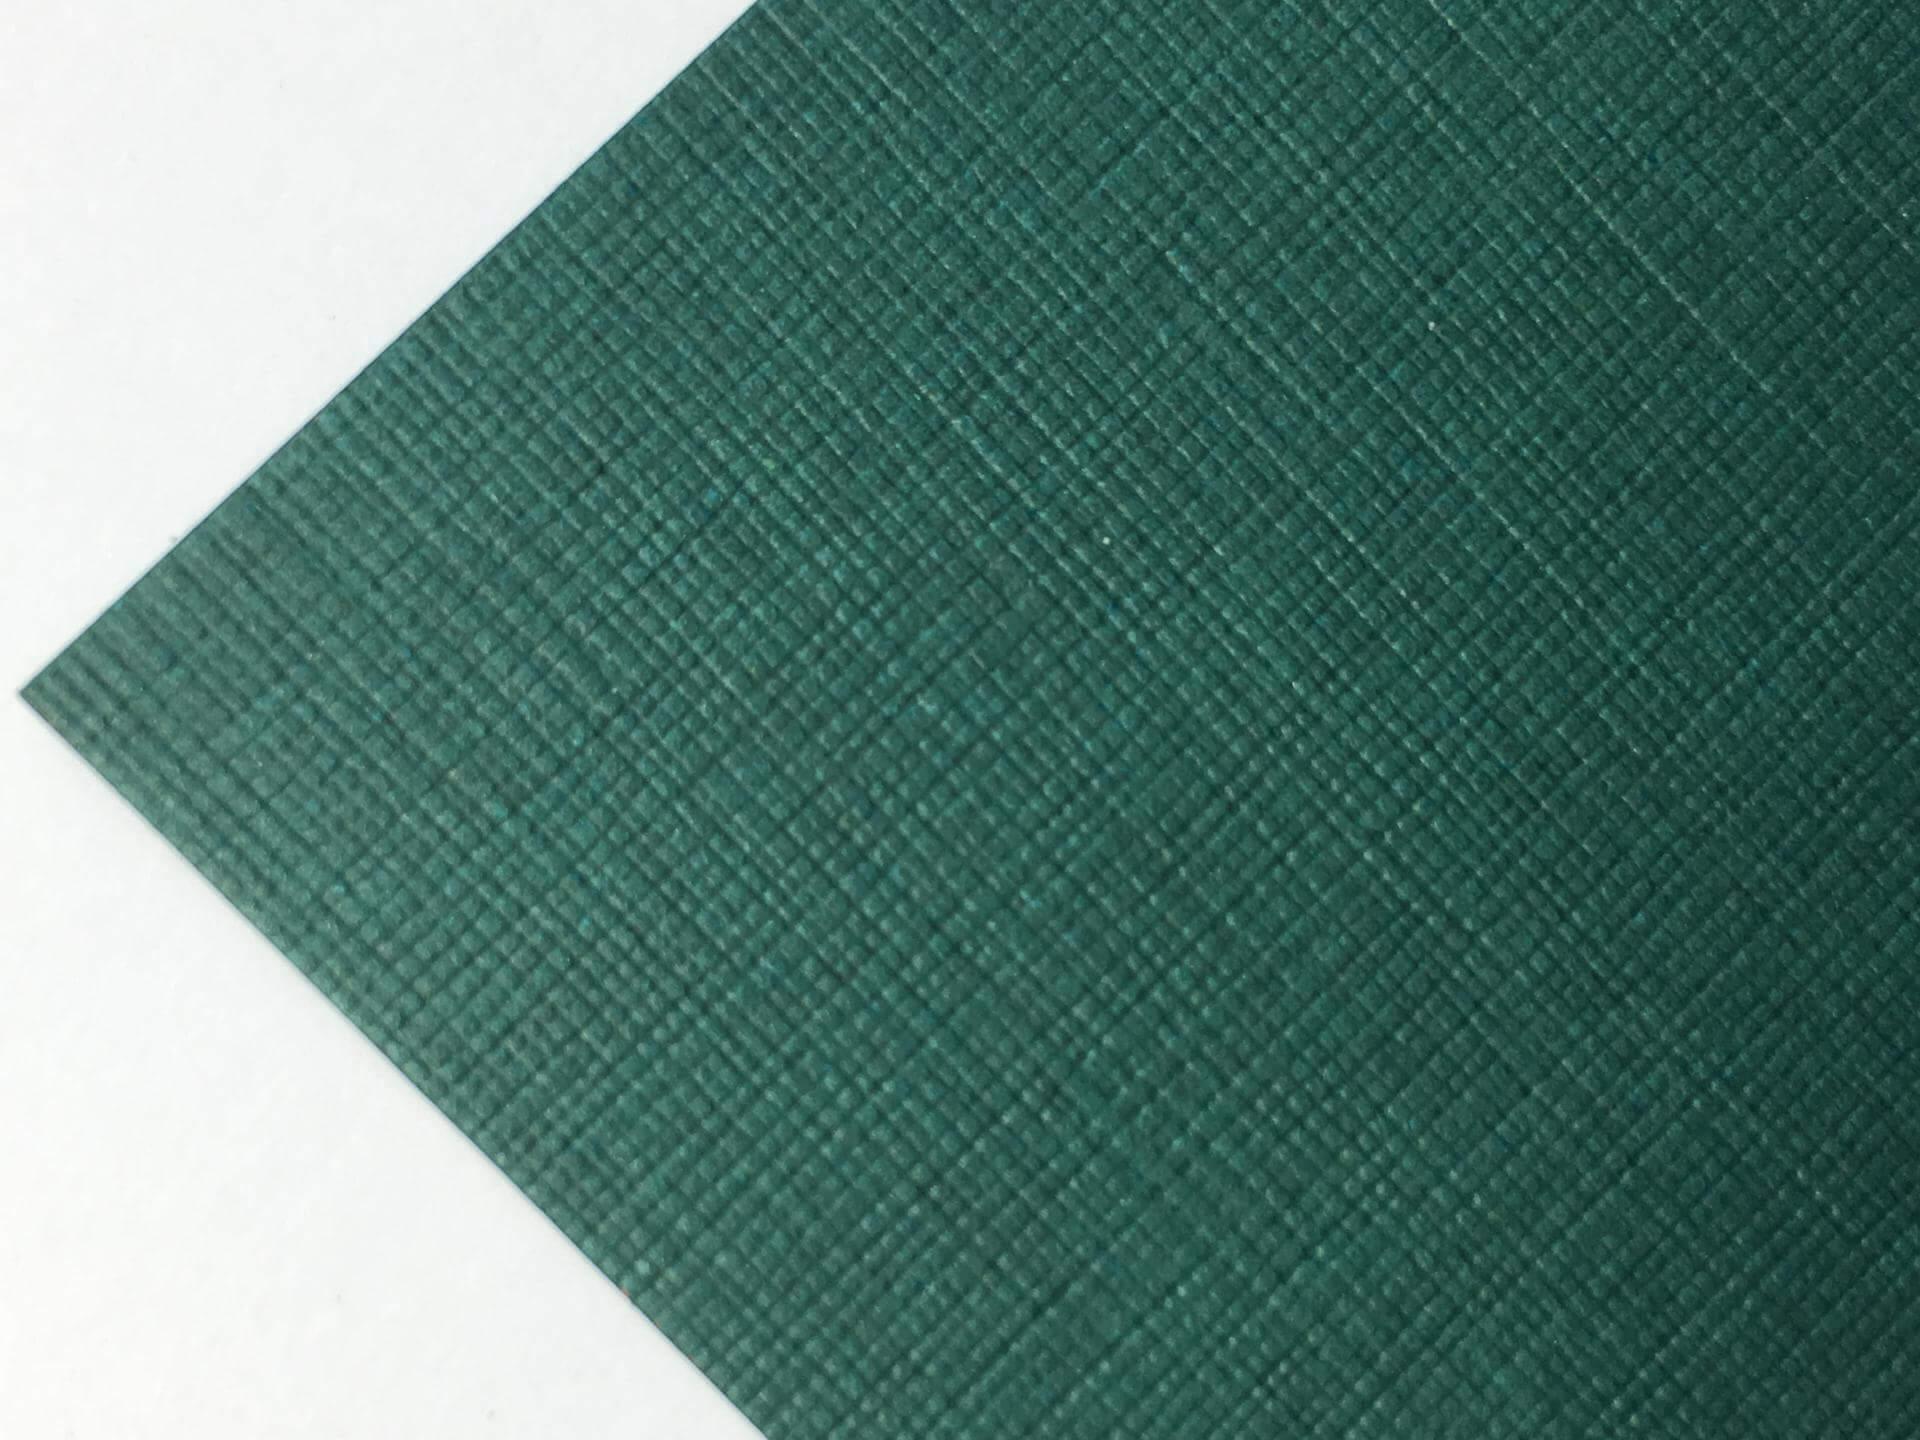 Imitlin fiandra verde edera